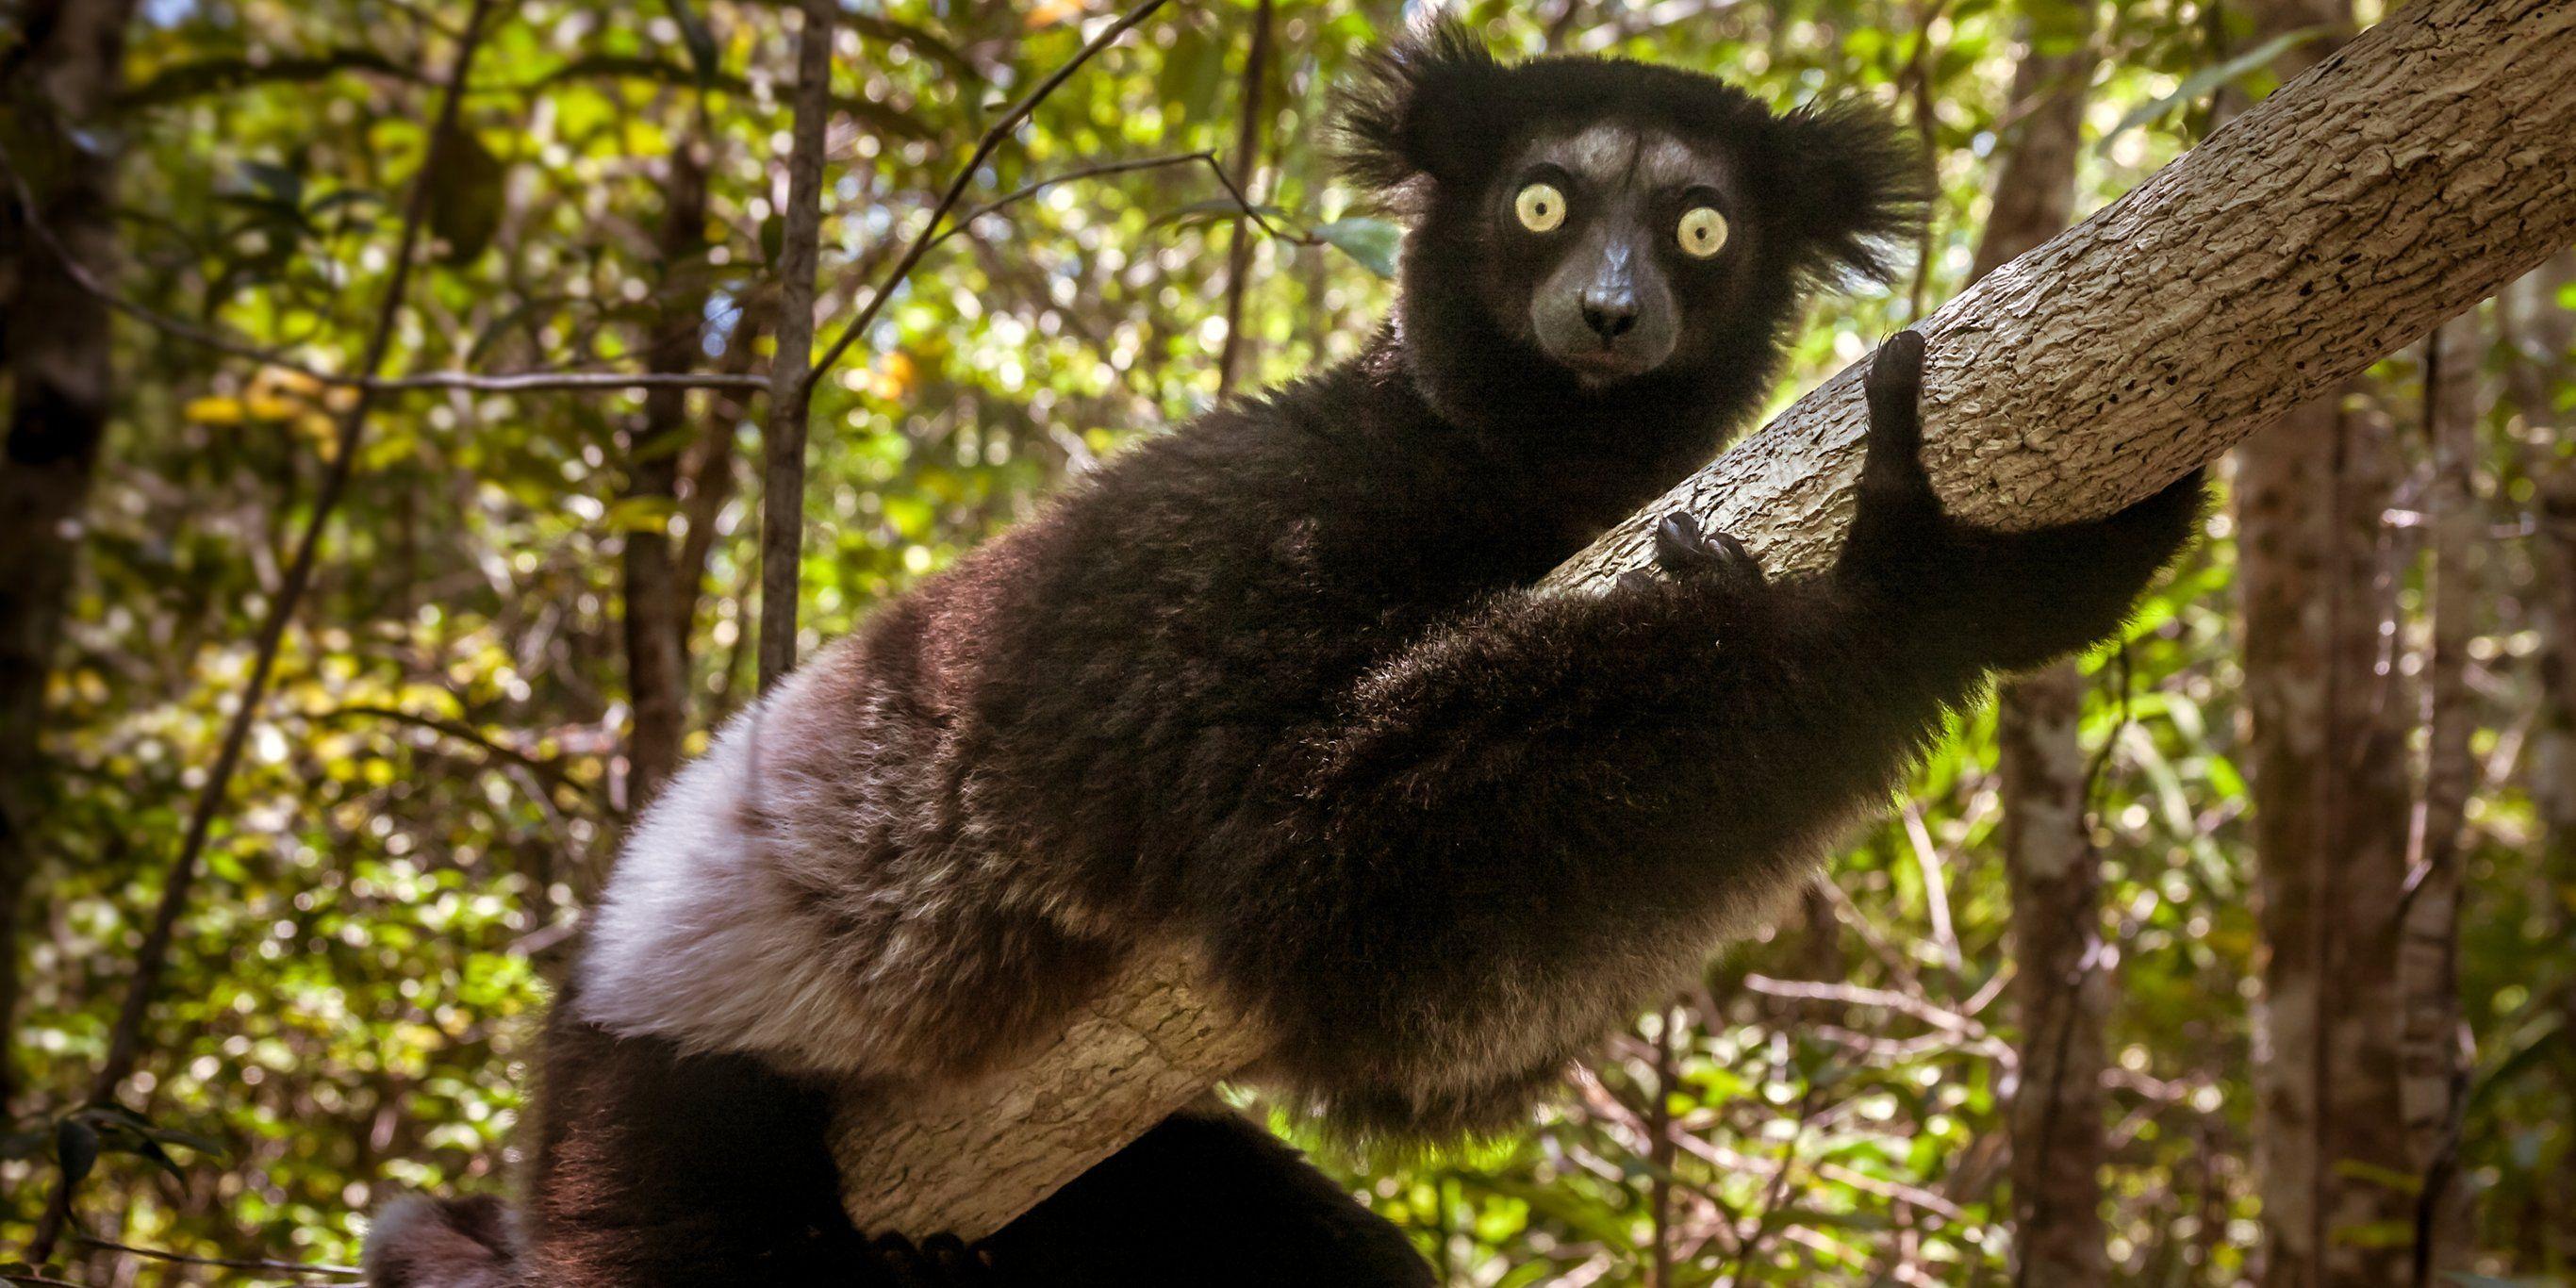 Mammals And Their Habitats